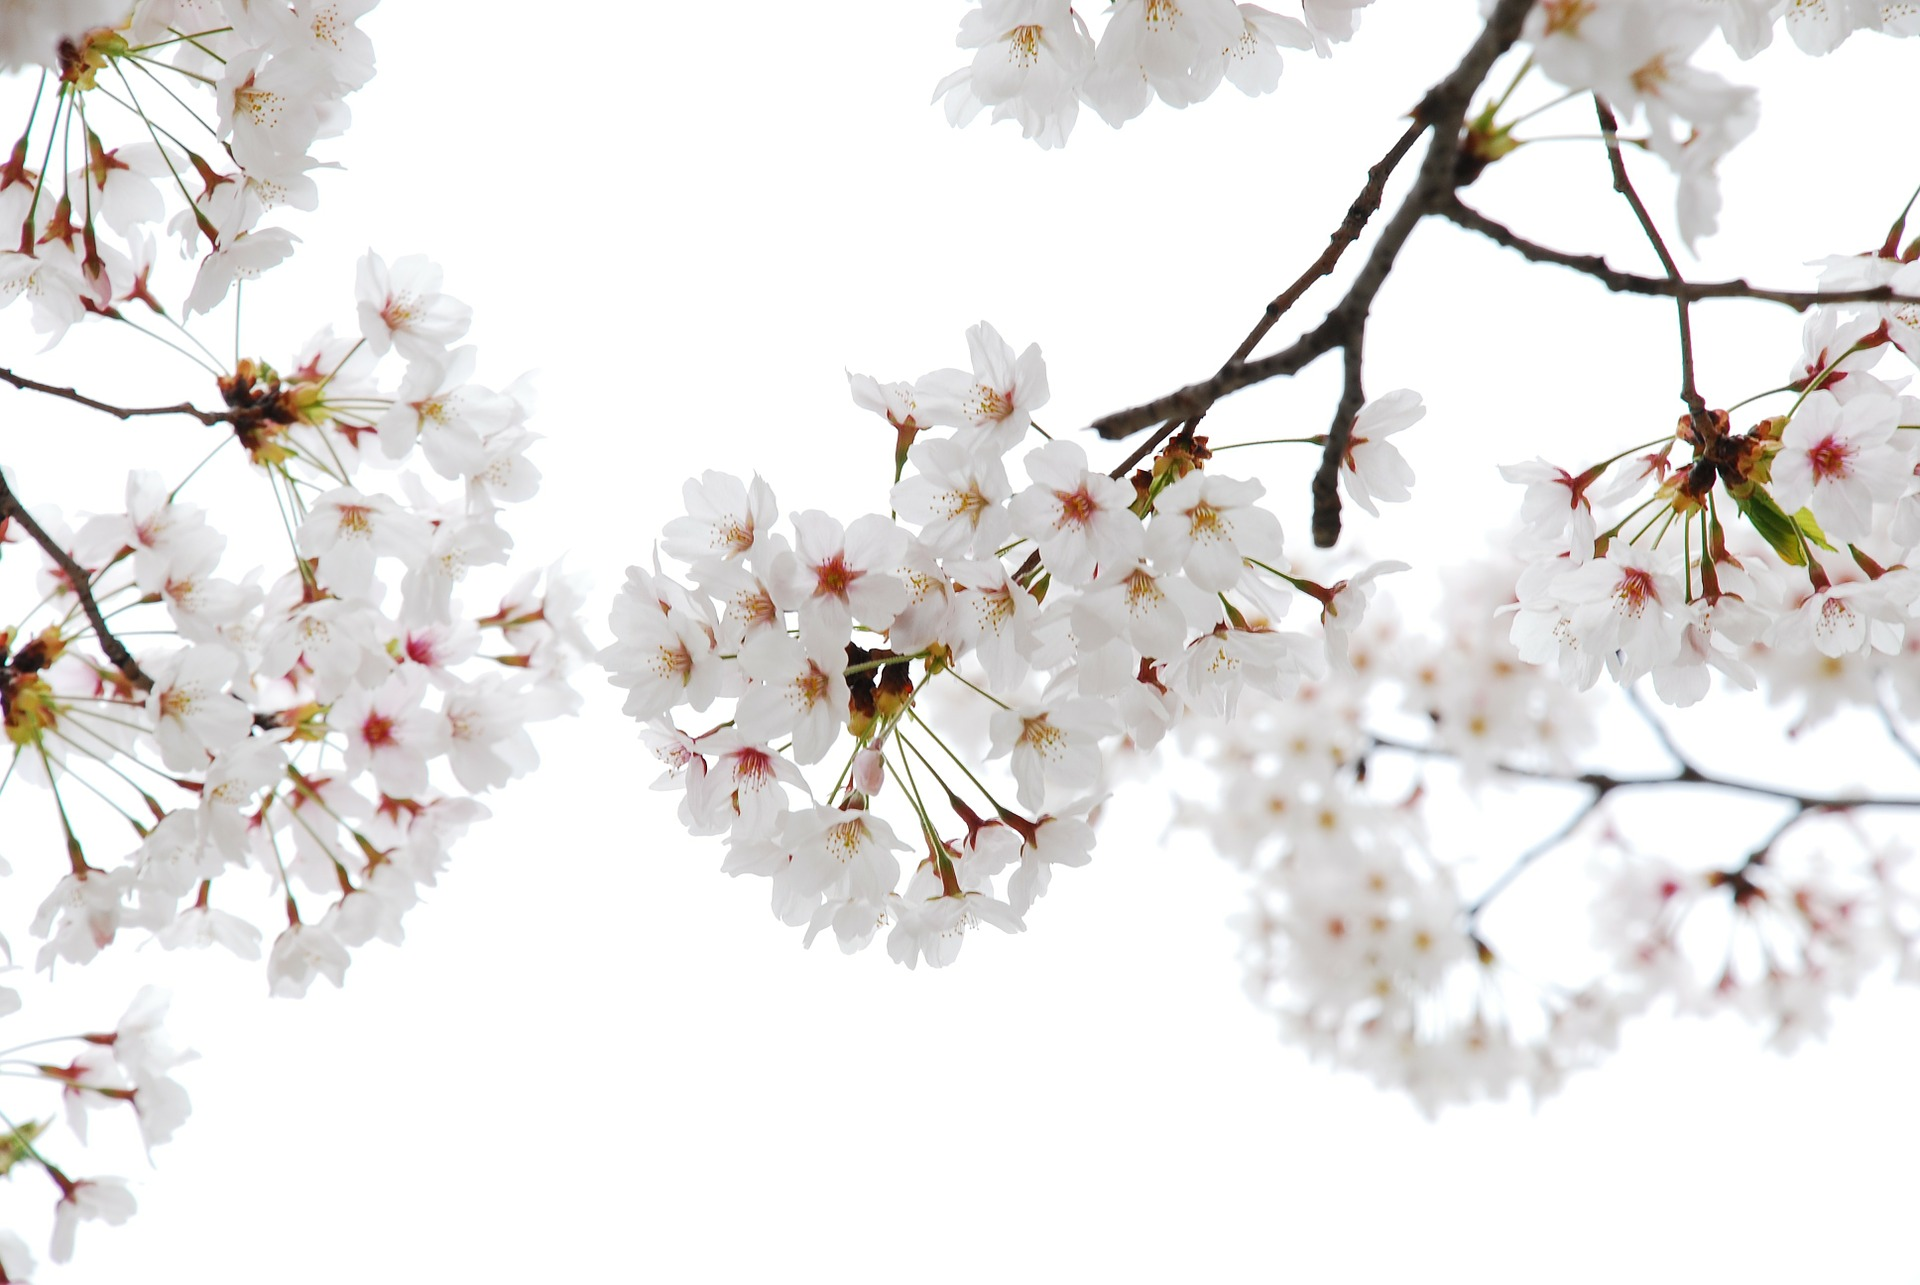 cherry-flowers-94817_1920.jpg